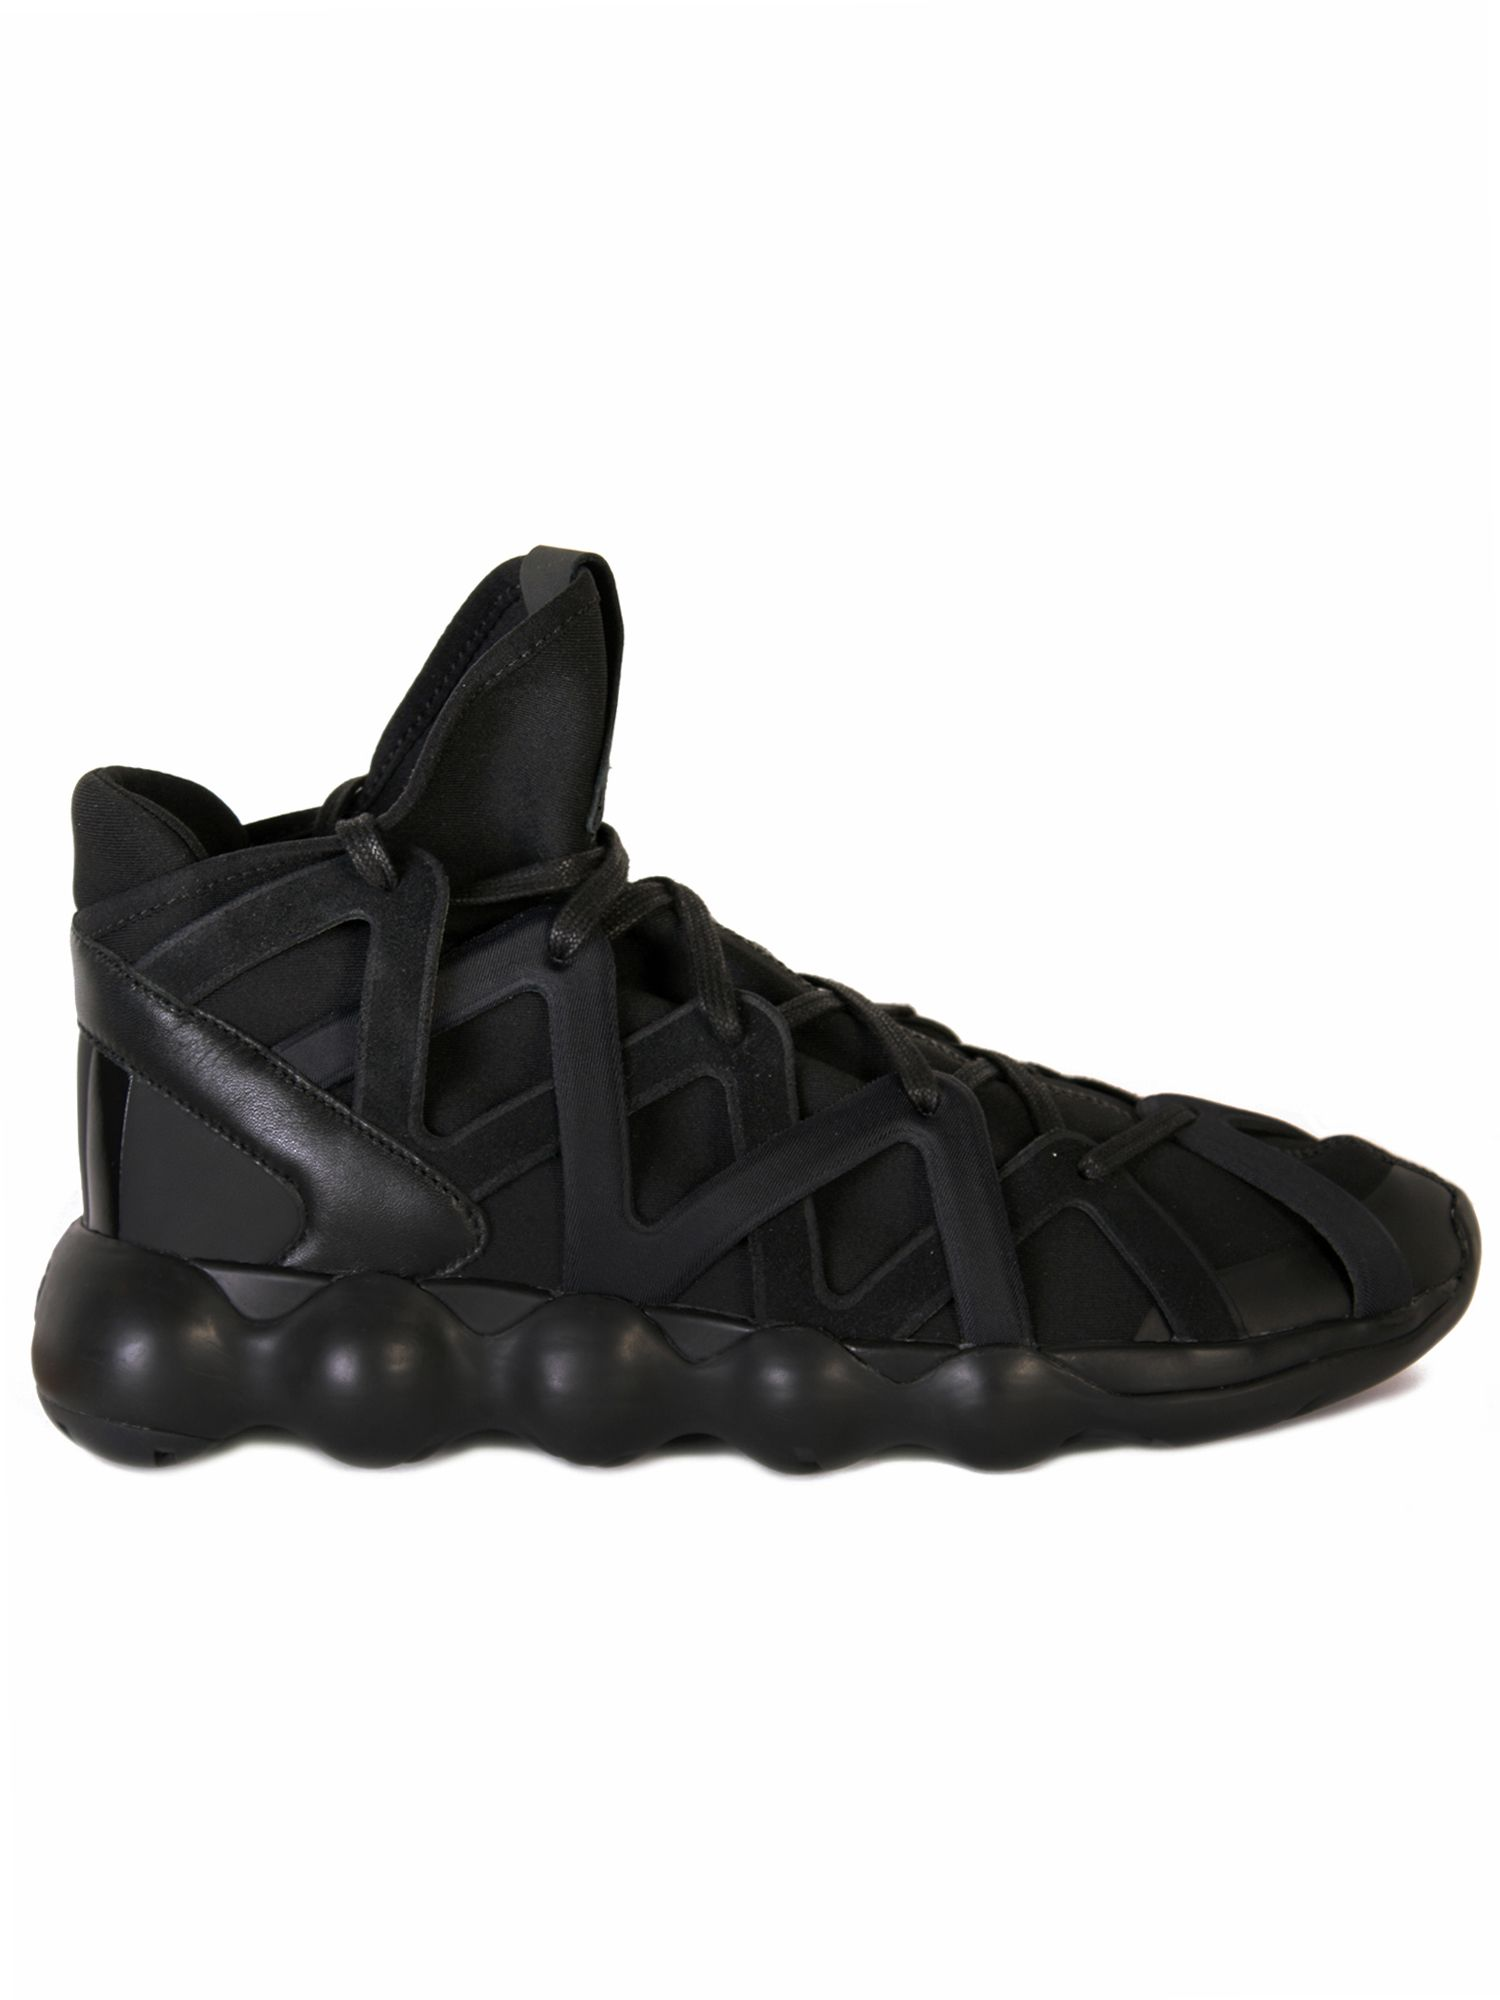 lace-up mesh sneakers - Black Yohji Yamamoto 1d1y0Lre